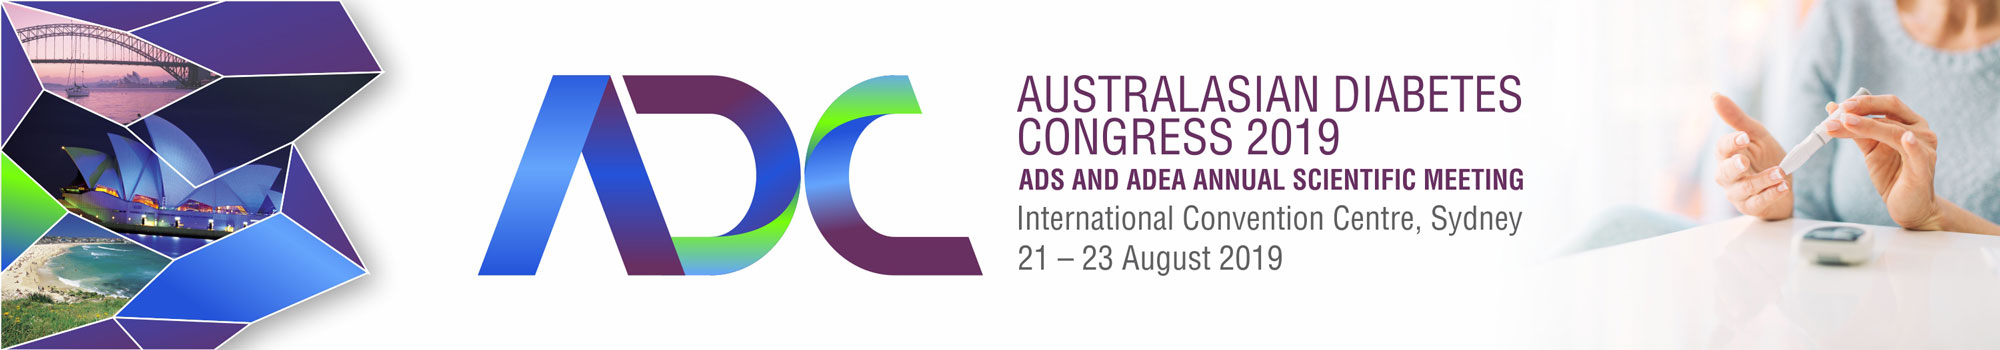 Australasian Diabetes Congress 2019